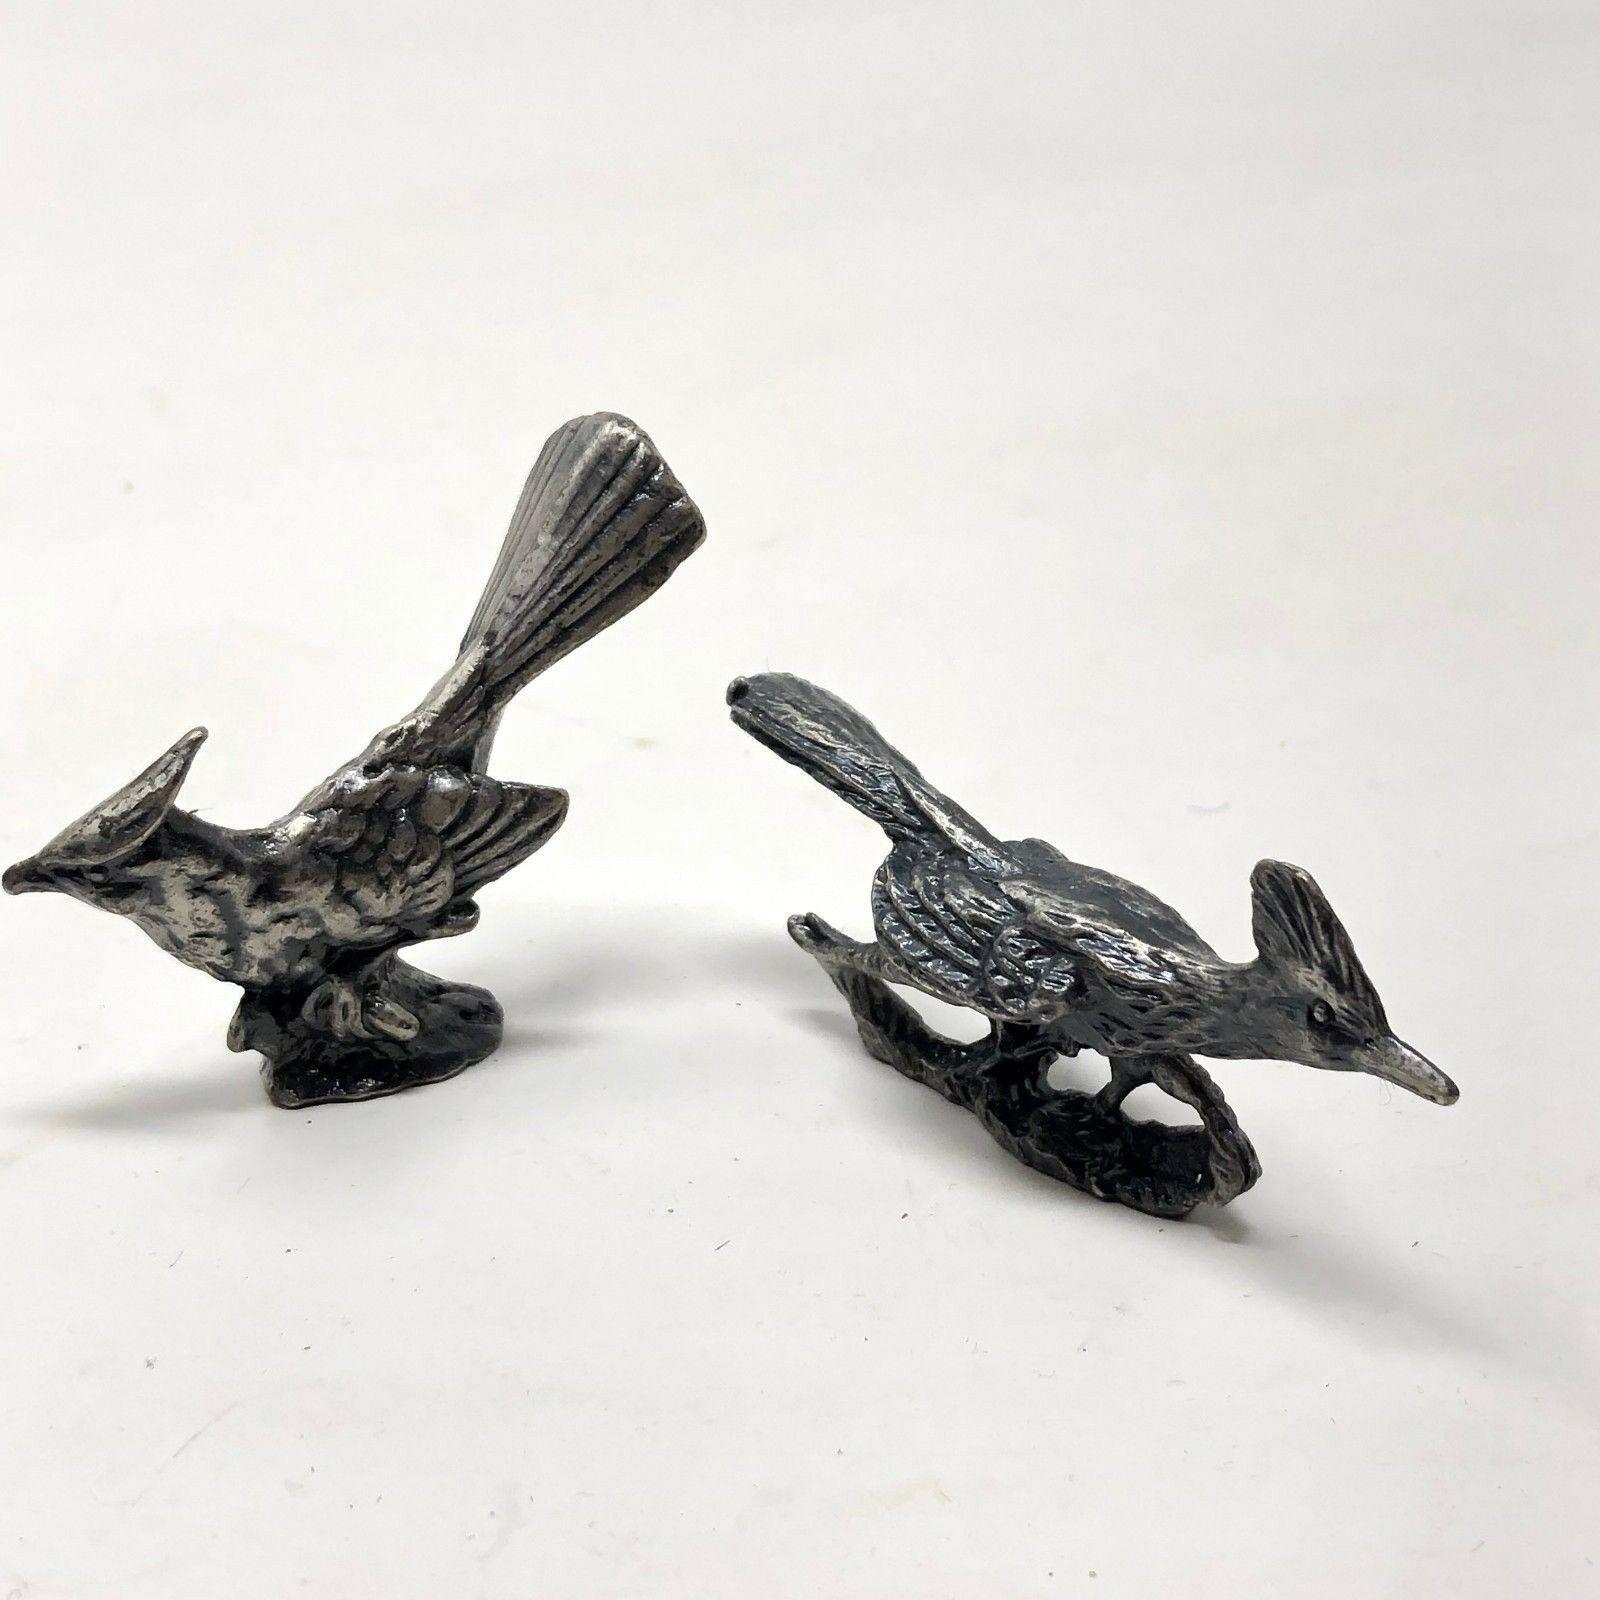 2 vintage pewter bird figurines